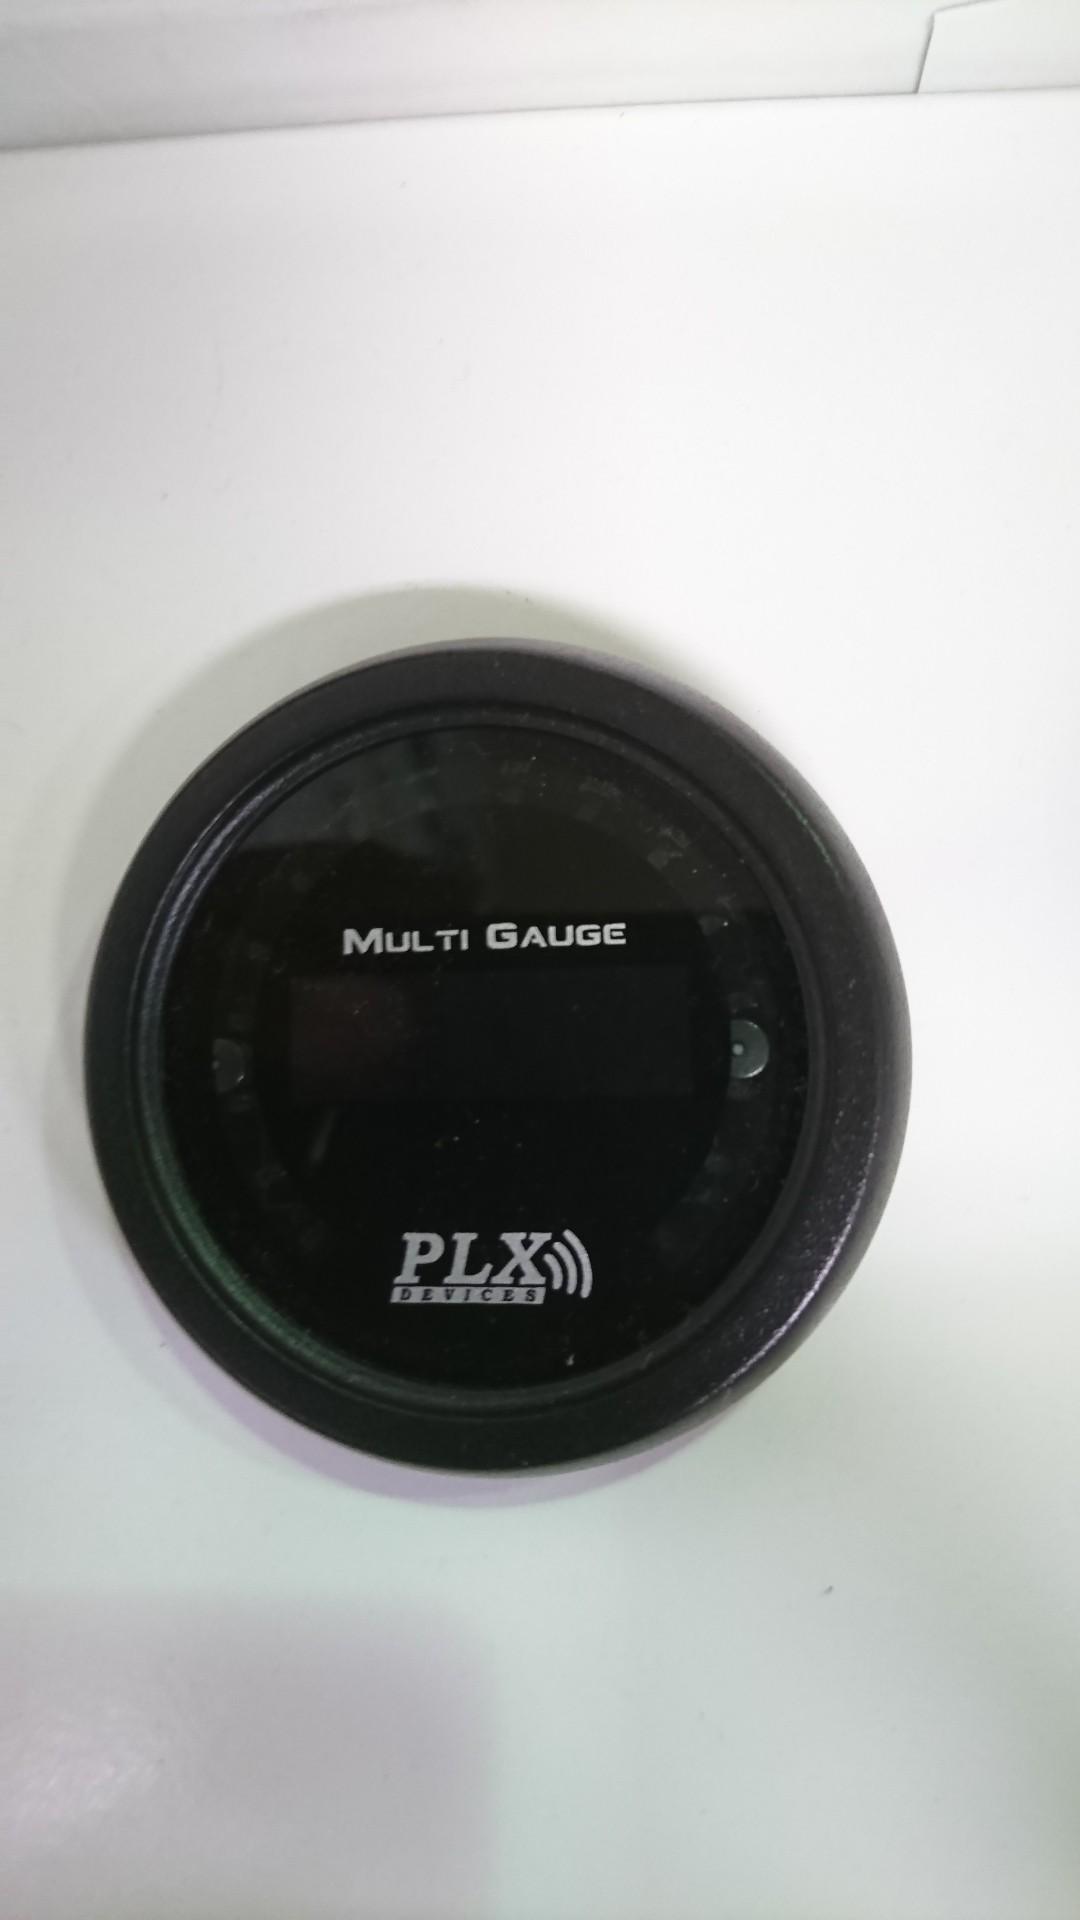 PLX DEVICES ワイドバンド 空燃比計 DM-6